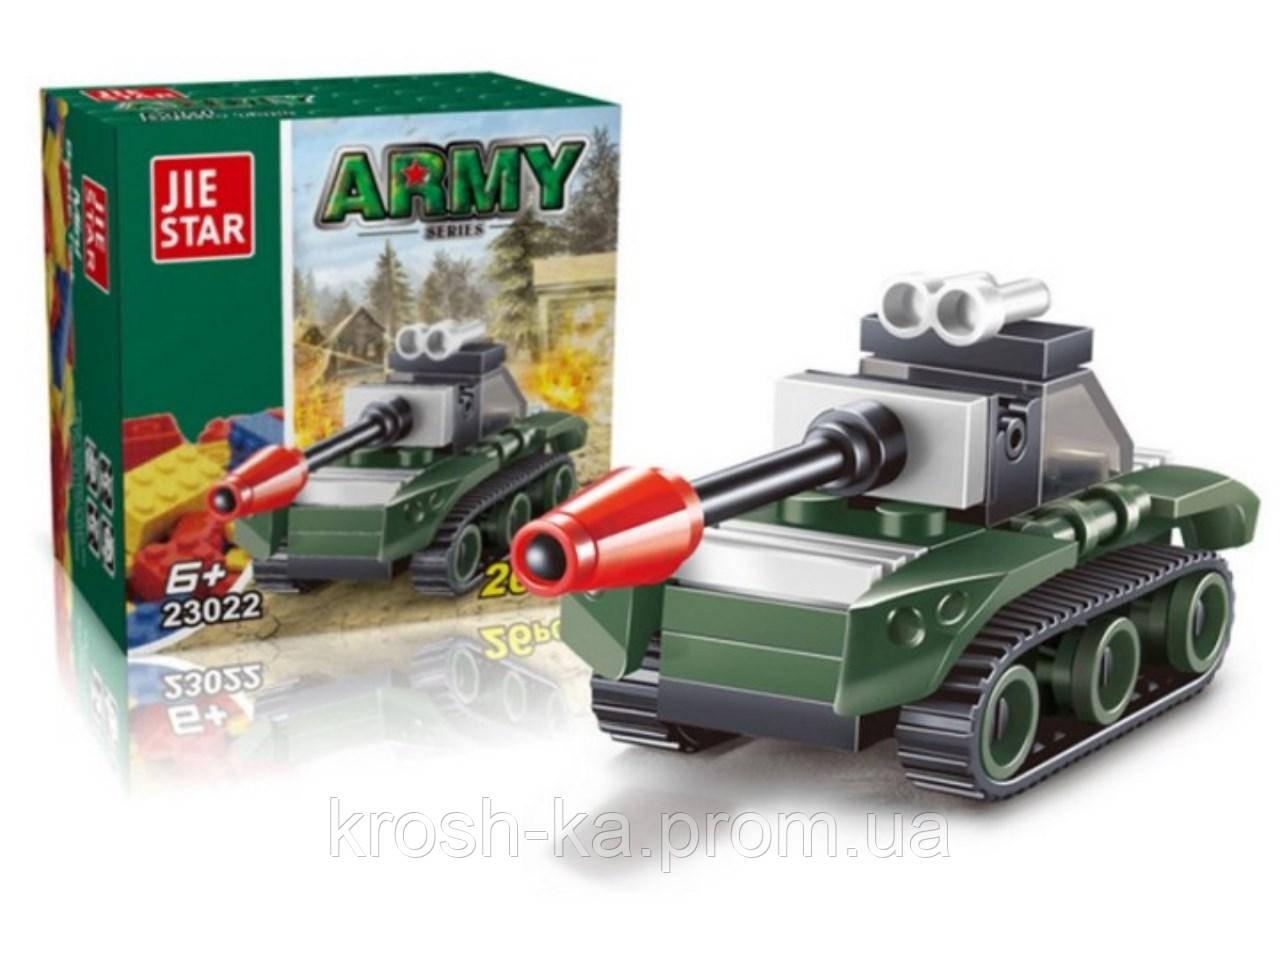 Конструктор Армия Jie Star 26 деталей Китай 23022